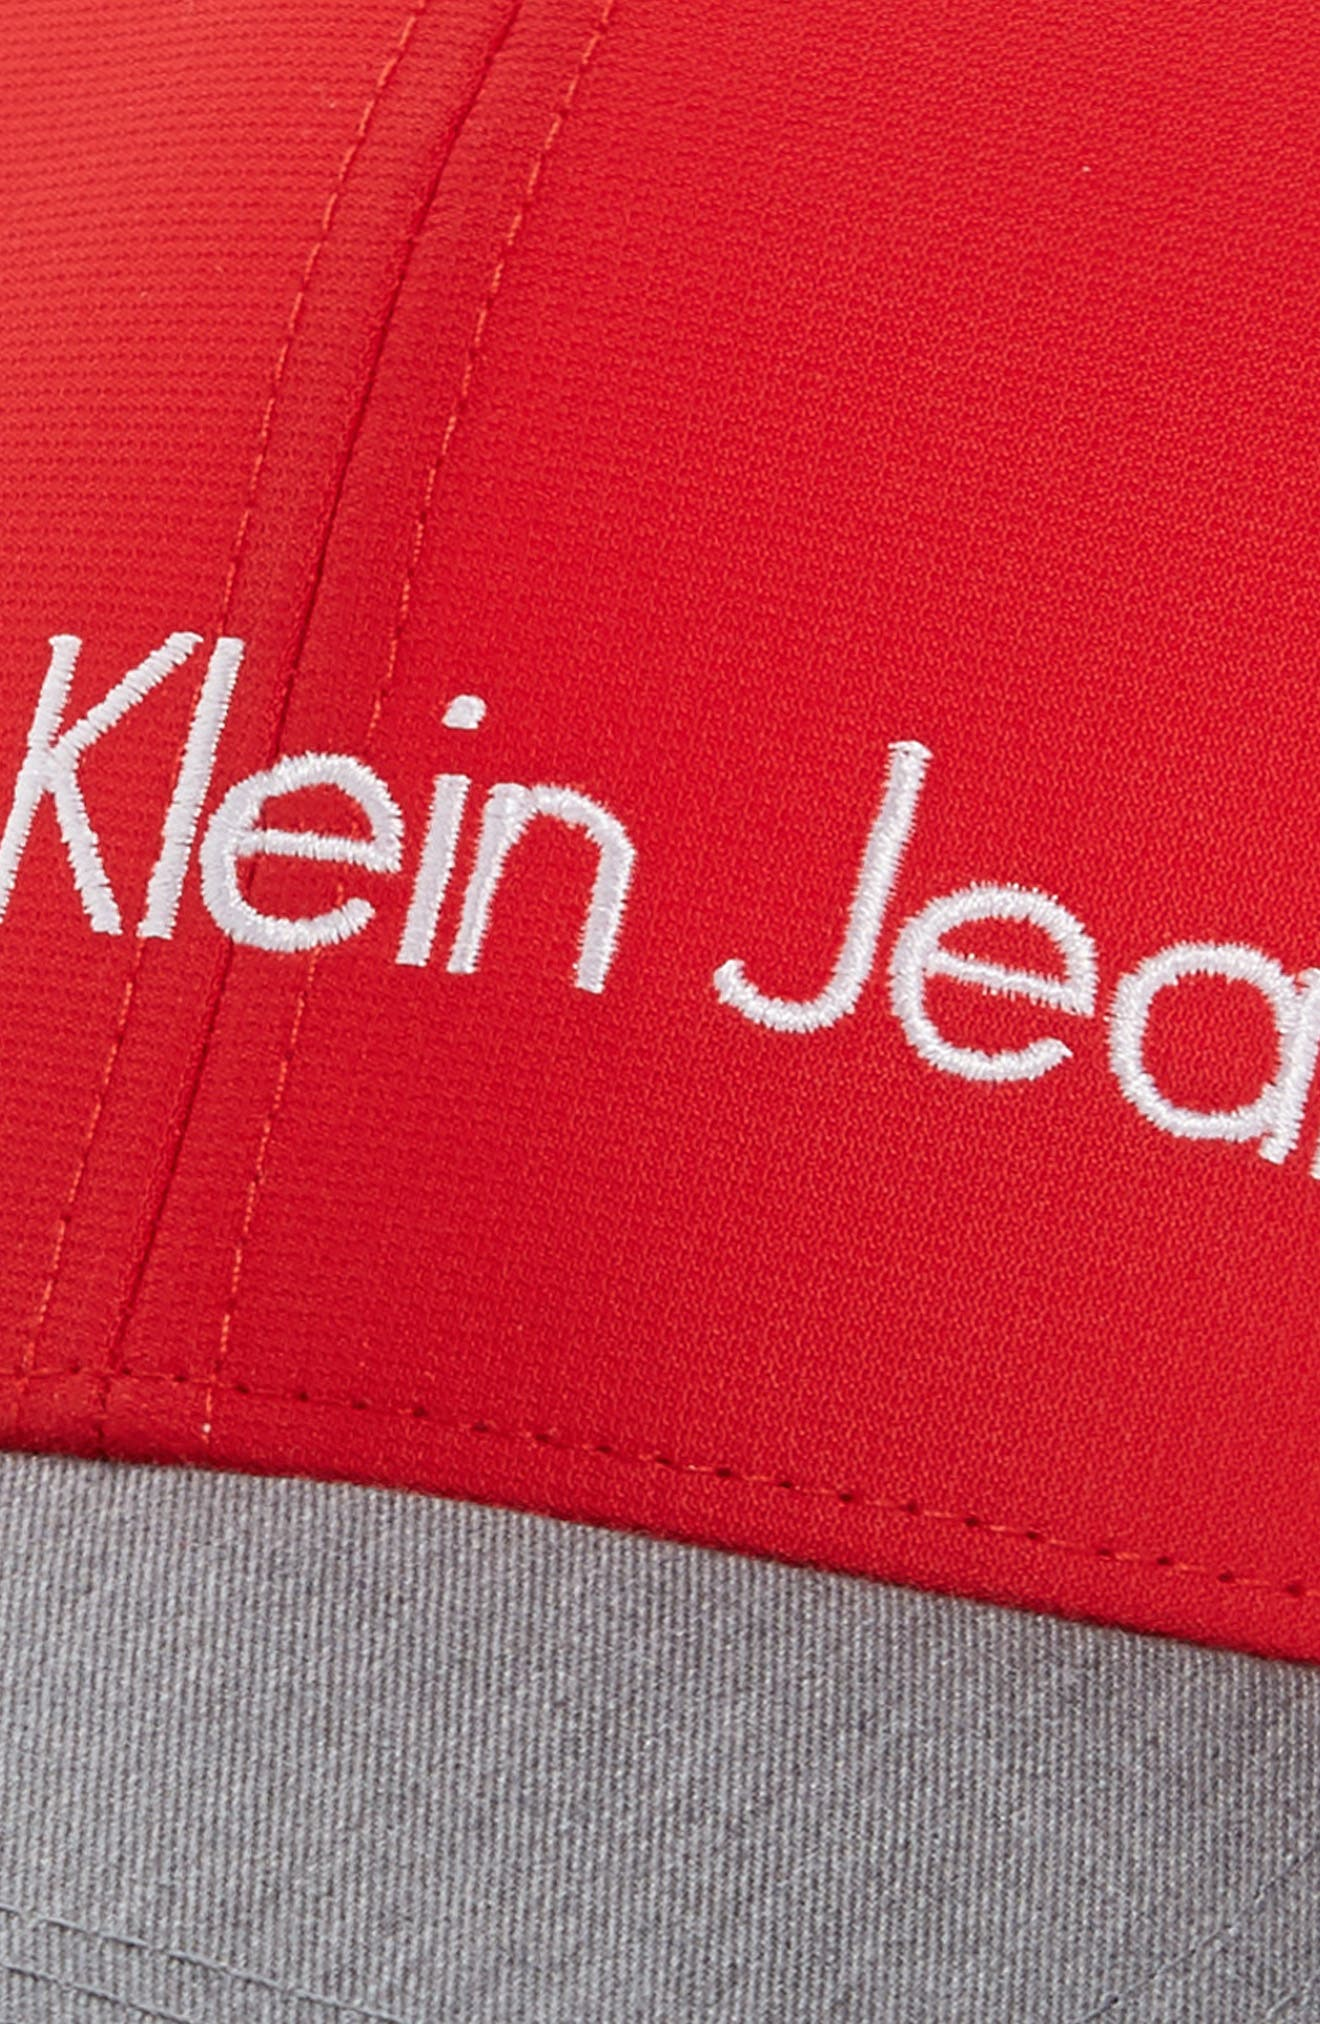 Calvin Klein Logo Trucker Cap,                             Alternate thumbnail 3, color,                             Red Gala